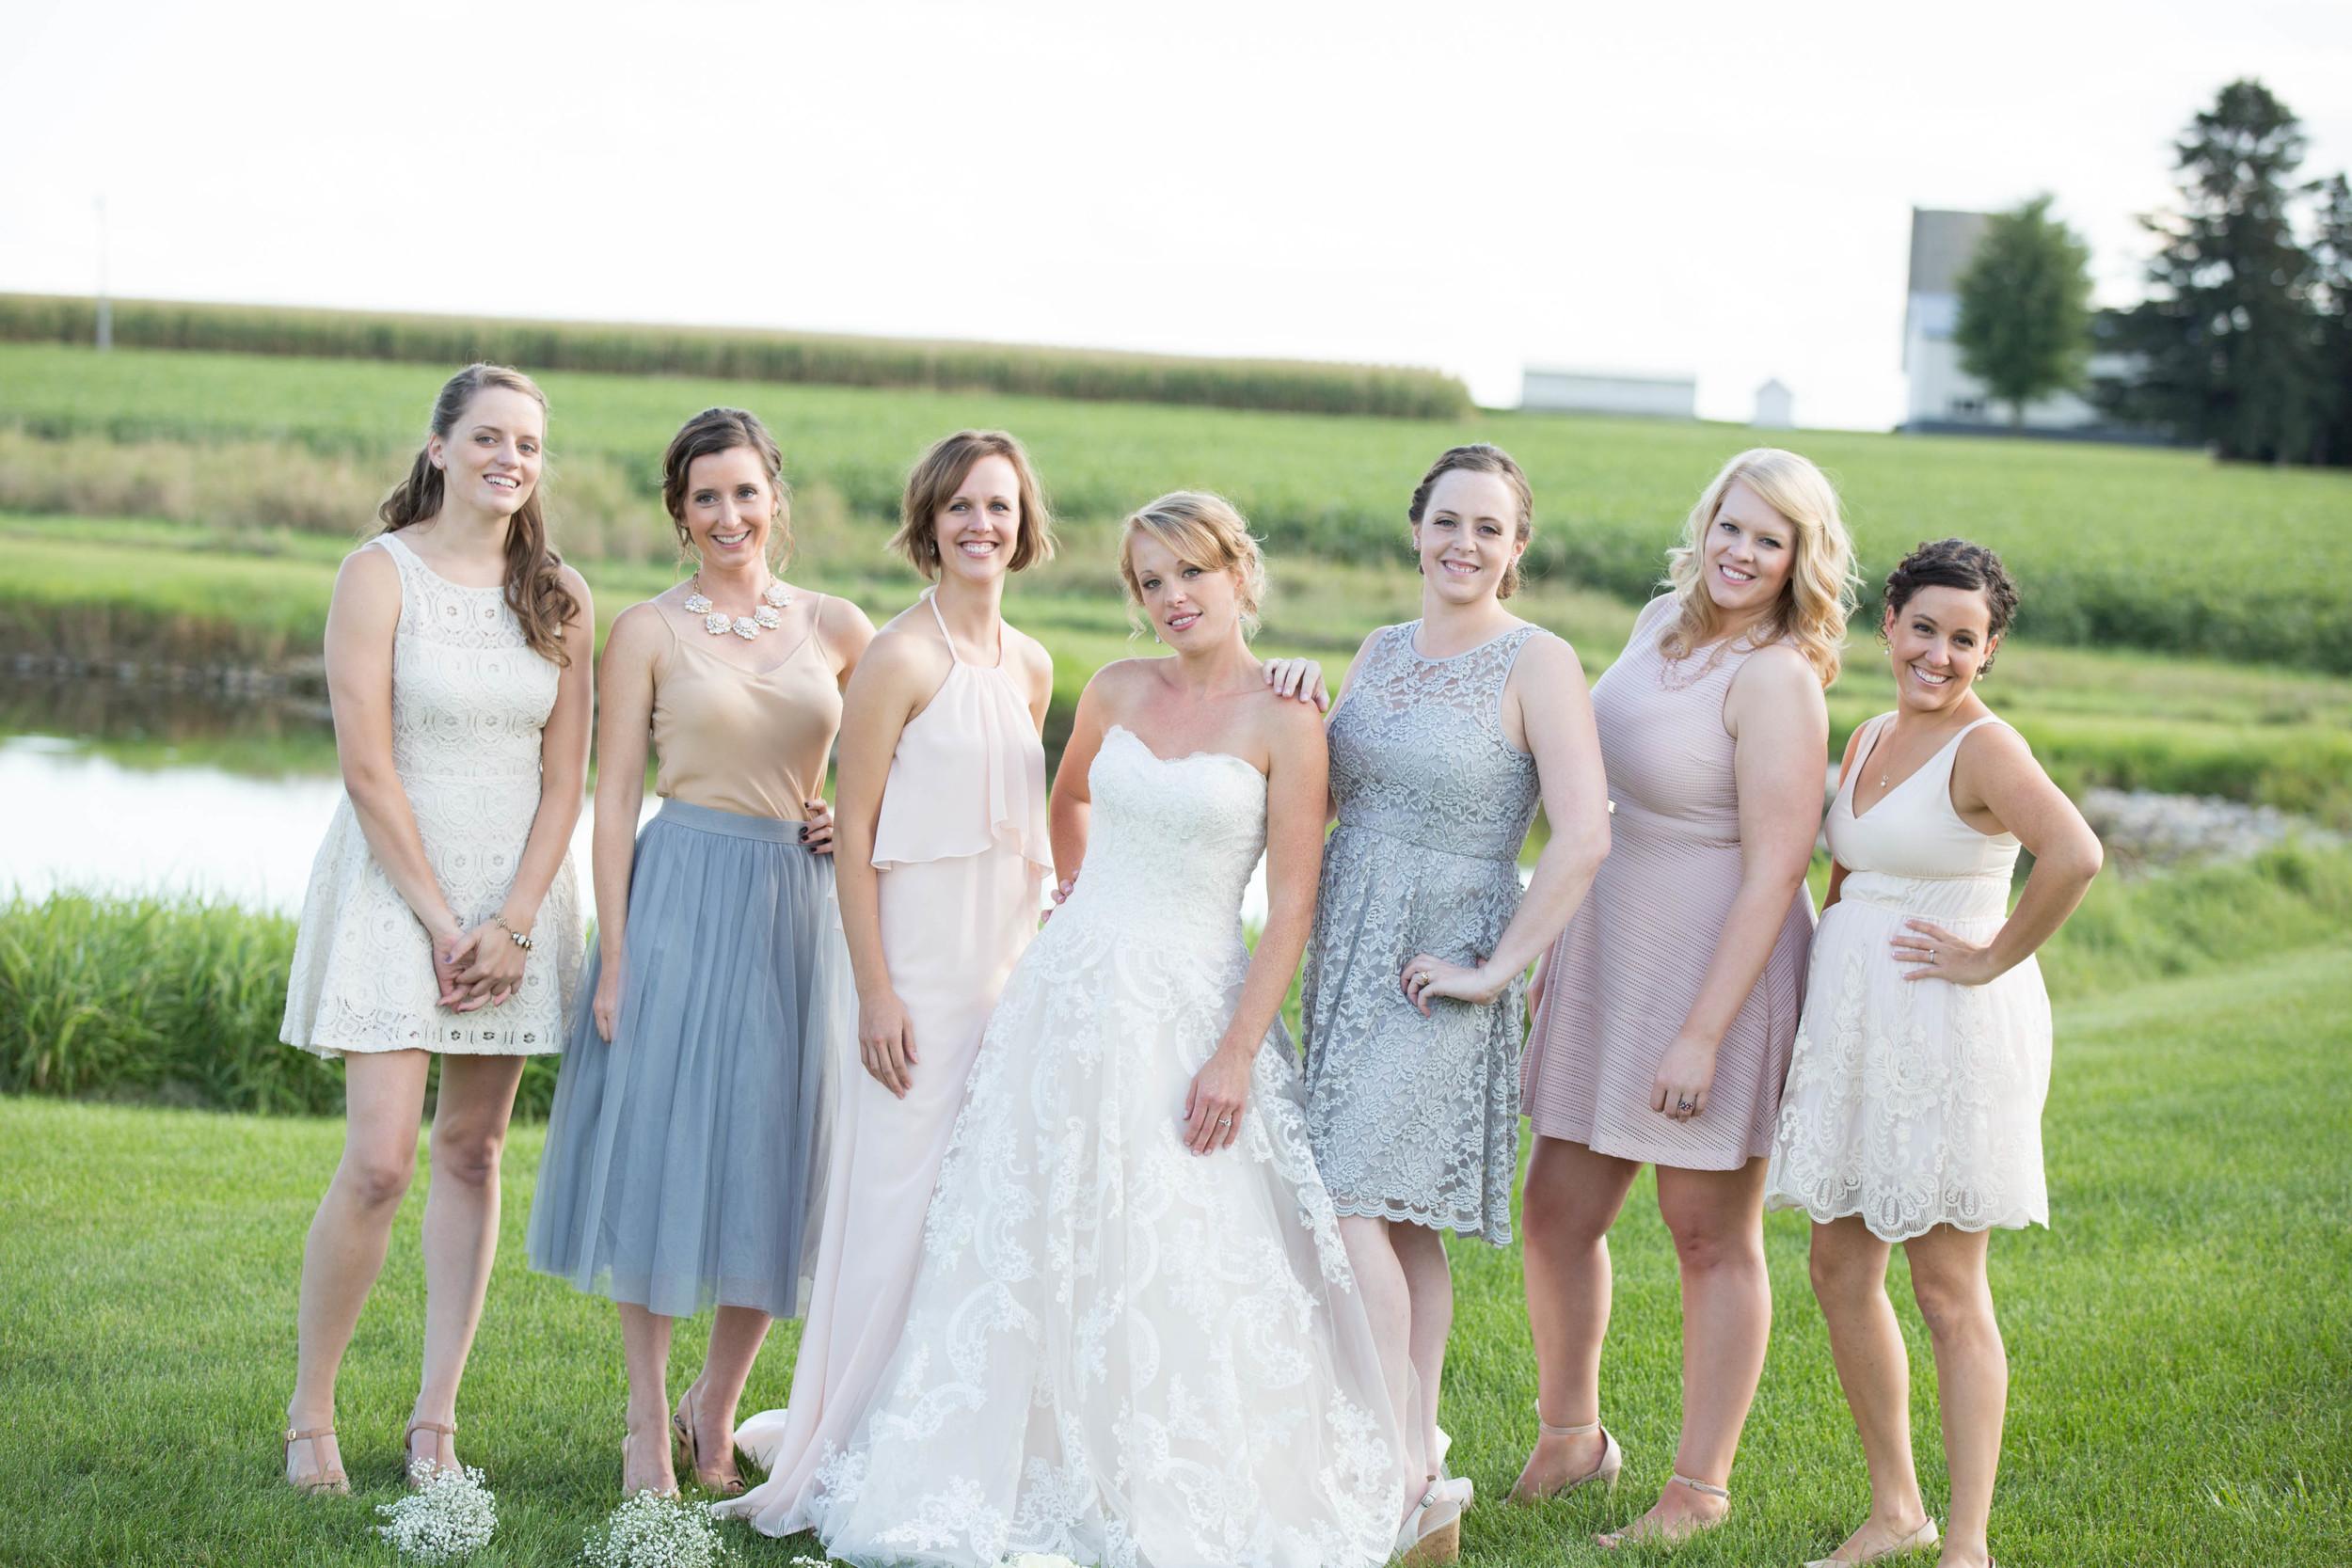 #mnwedding #mnphotographer #countrycharm  #bridalparty